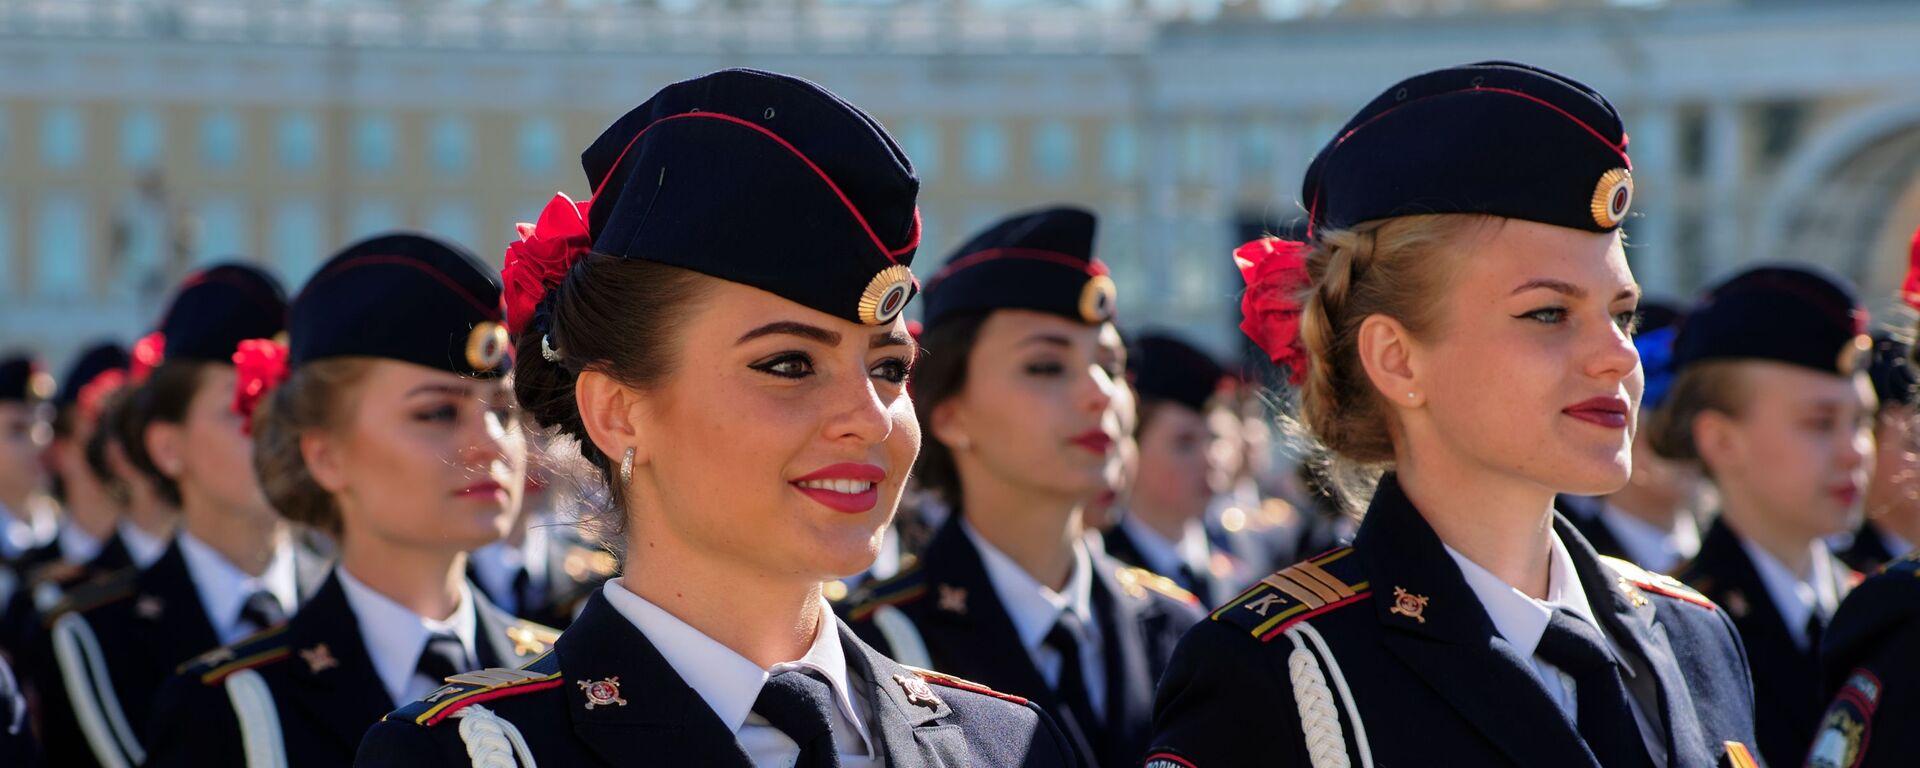 Le donne soldato russe - Sputnik Italia, 1920, 29.08.2018